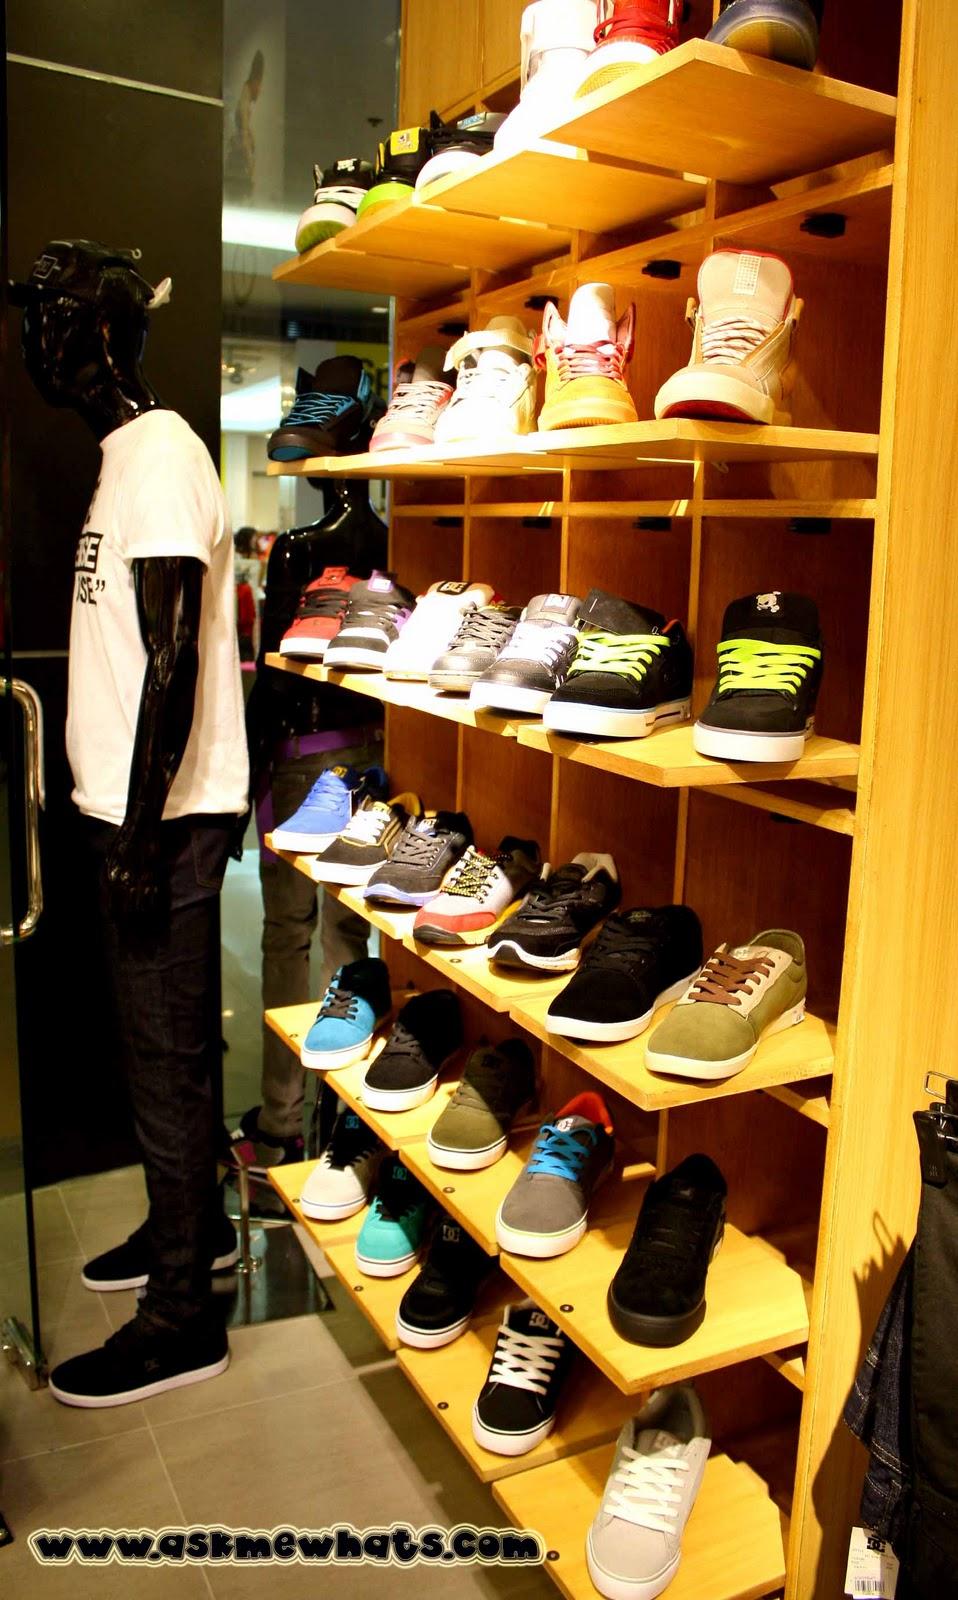 Skate shoes in cebu - Askmewhats